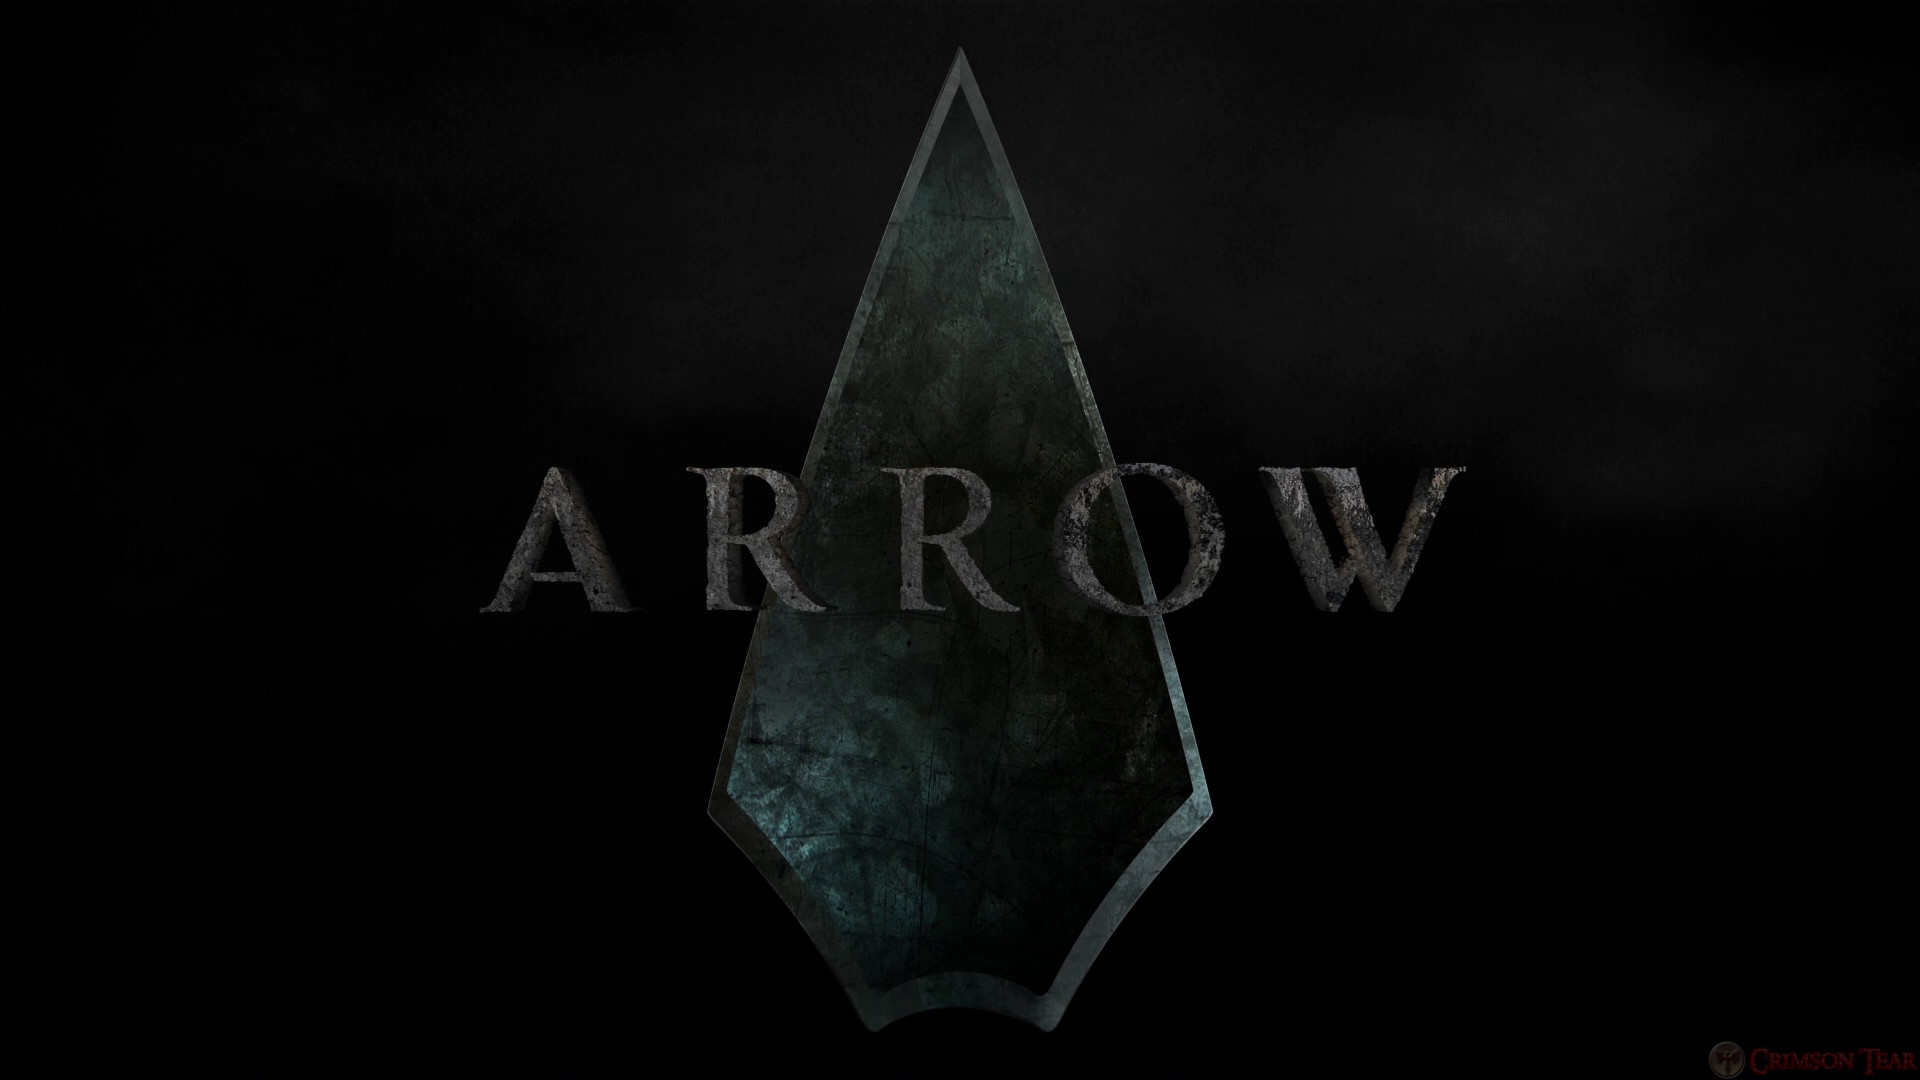 Green Arrow HQ Definition Live Wallpaper – DSC976 Screenshot